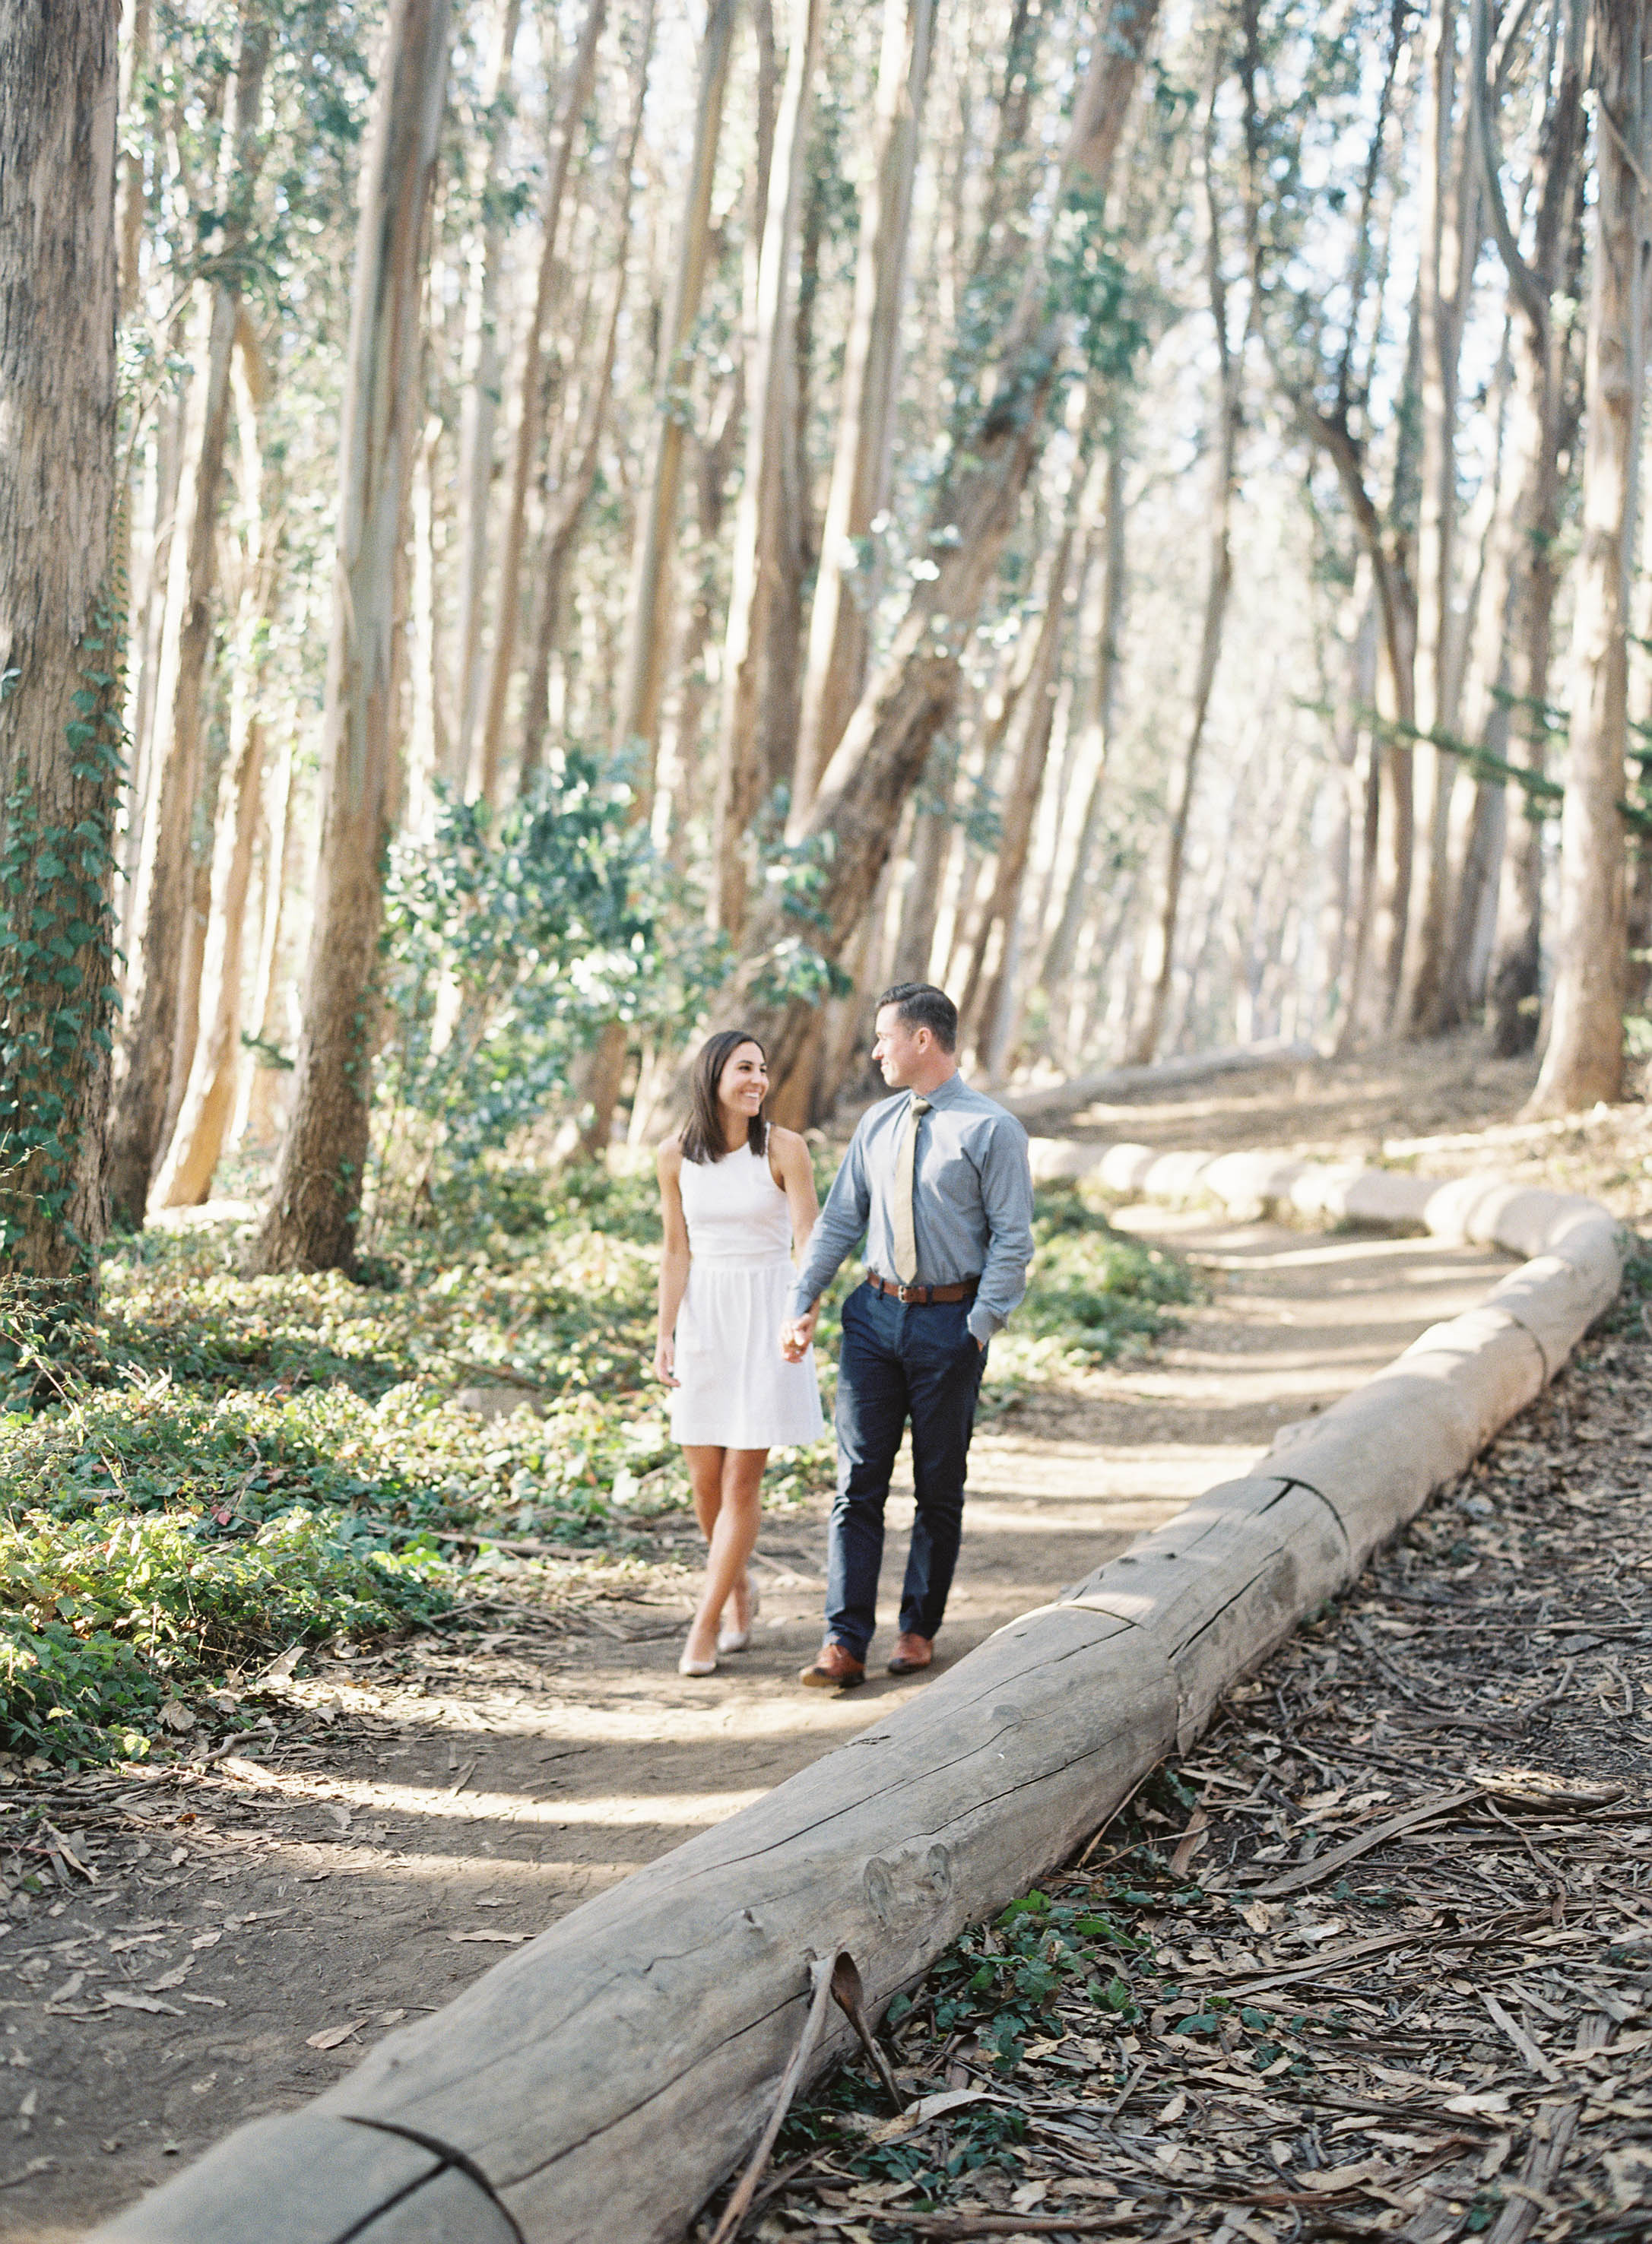 Meghan Mehan Photography - Fine Art Film Photography - California | San Francisco | Napa | Sonoma | Carmel | Big Sur | Santa Barbara | Nashville 008.jpg